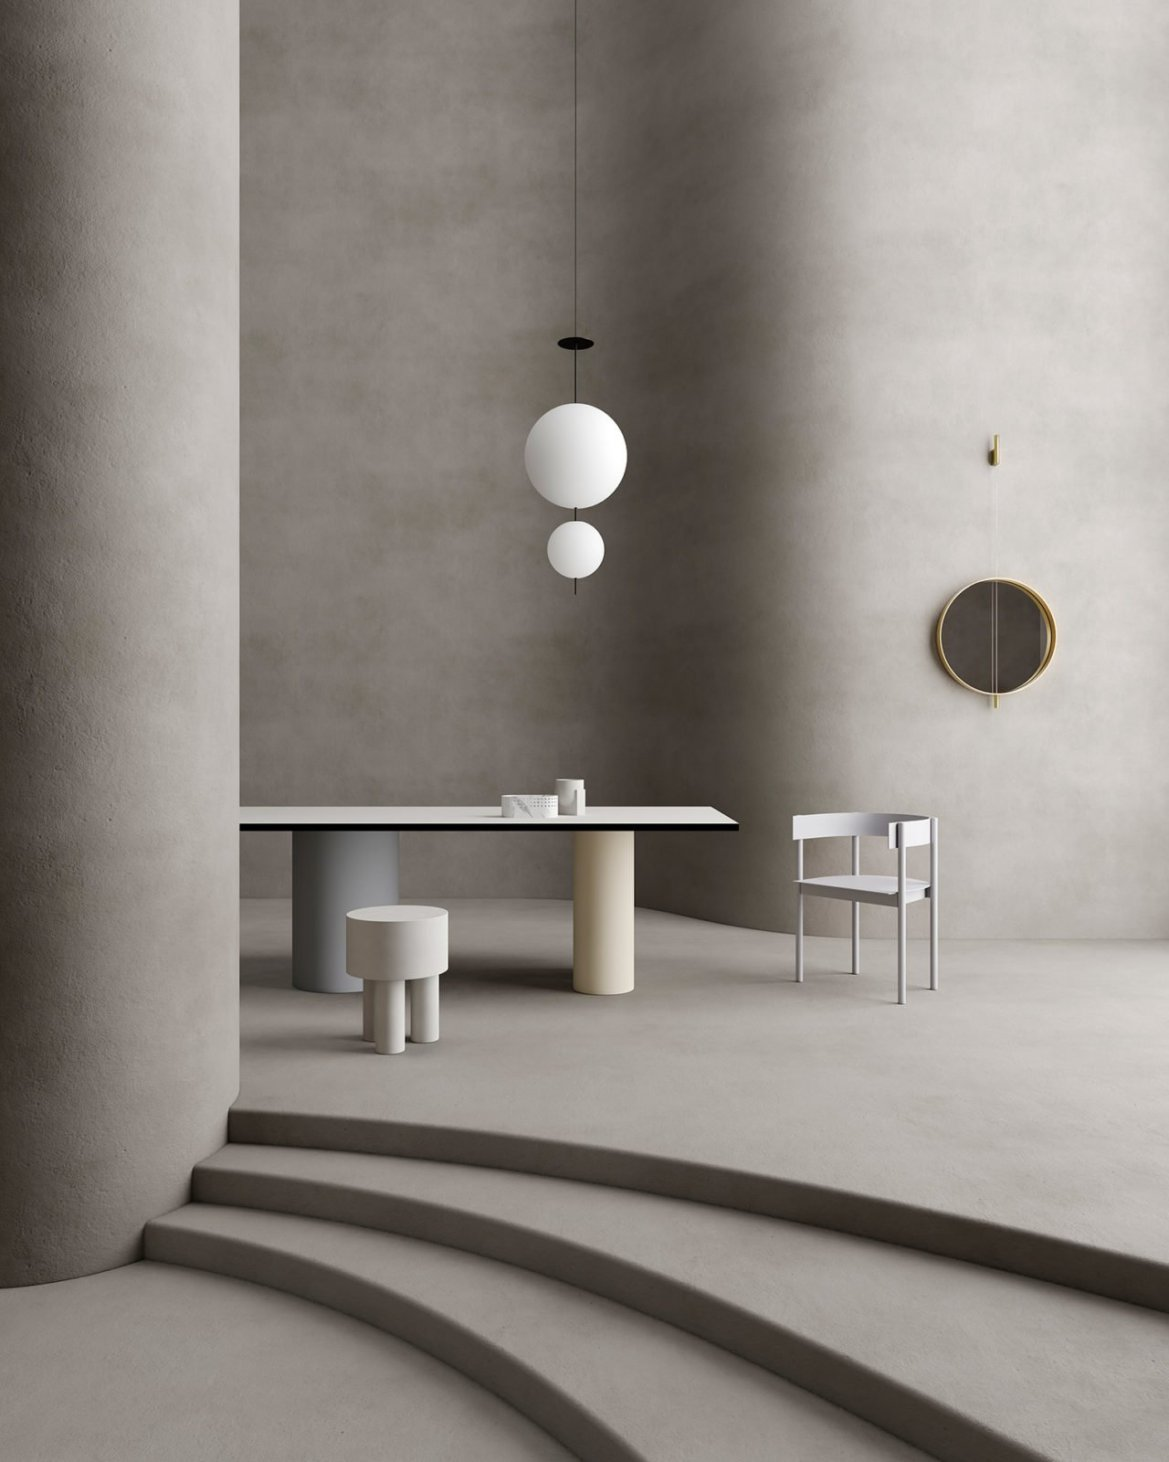 Set design in an organic Interior, Cristina Lello.